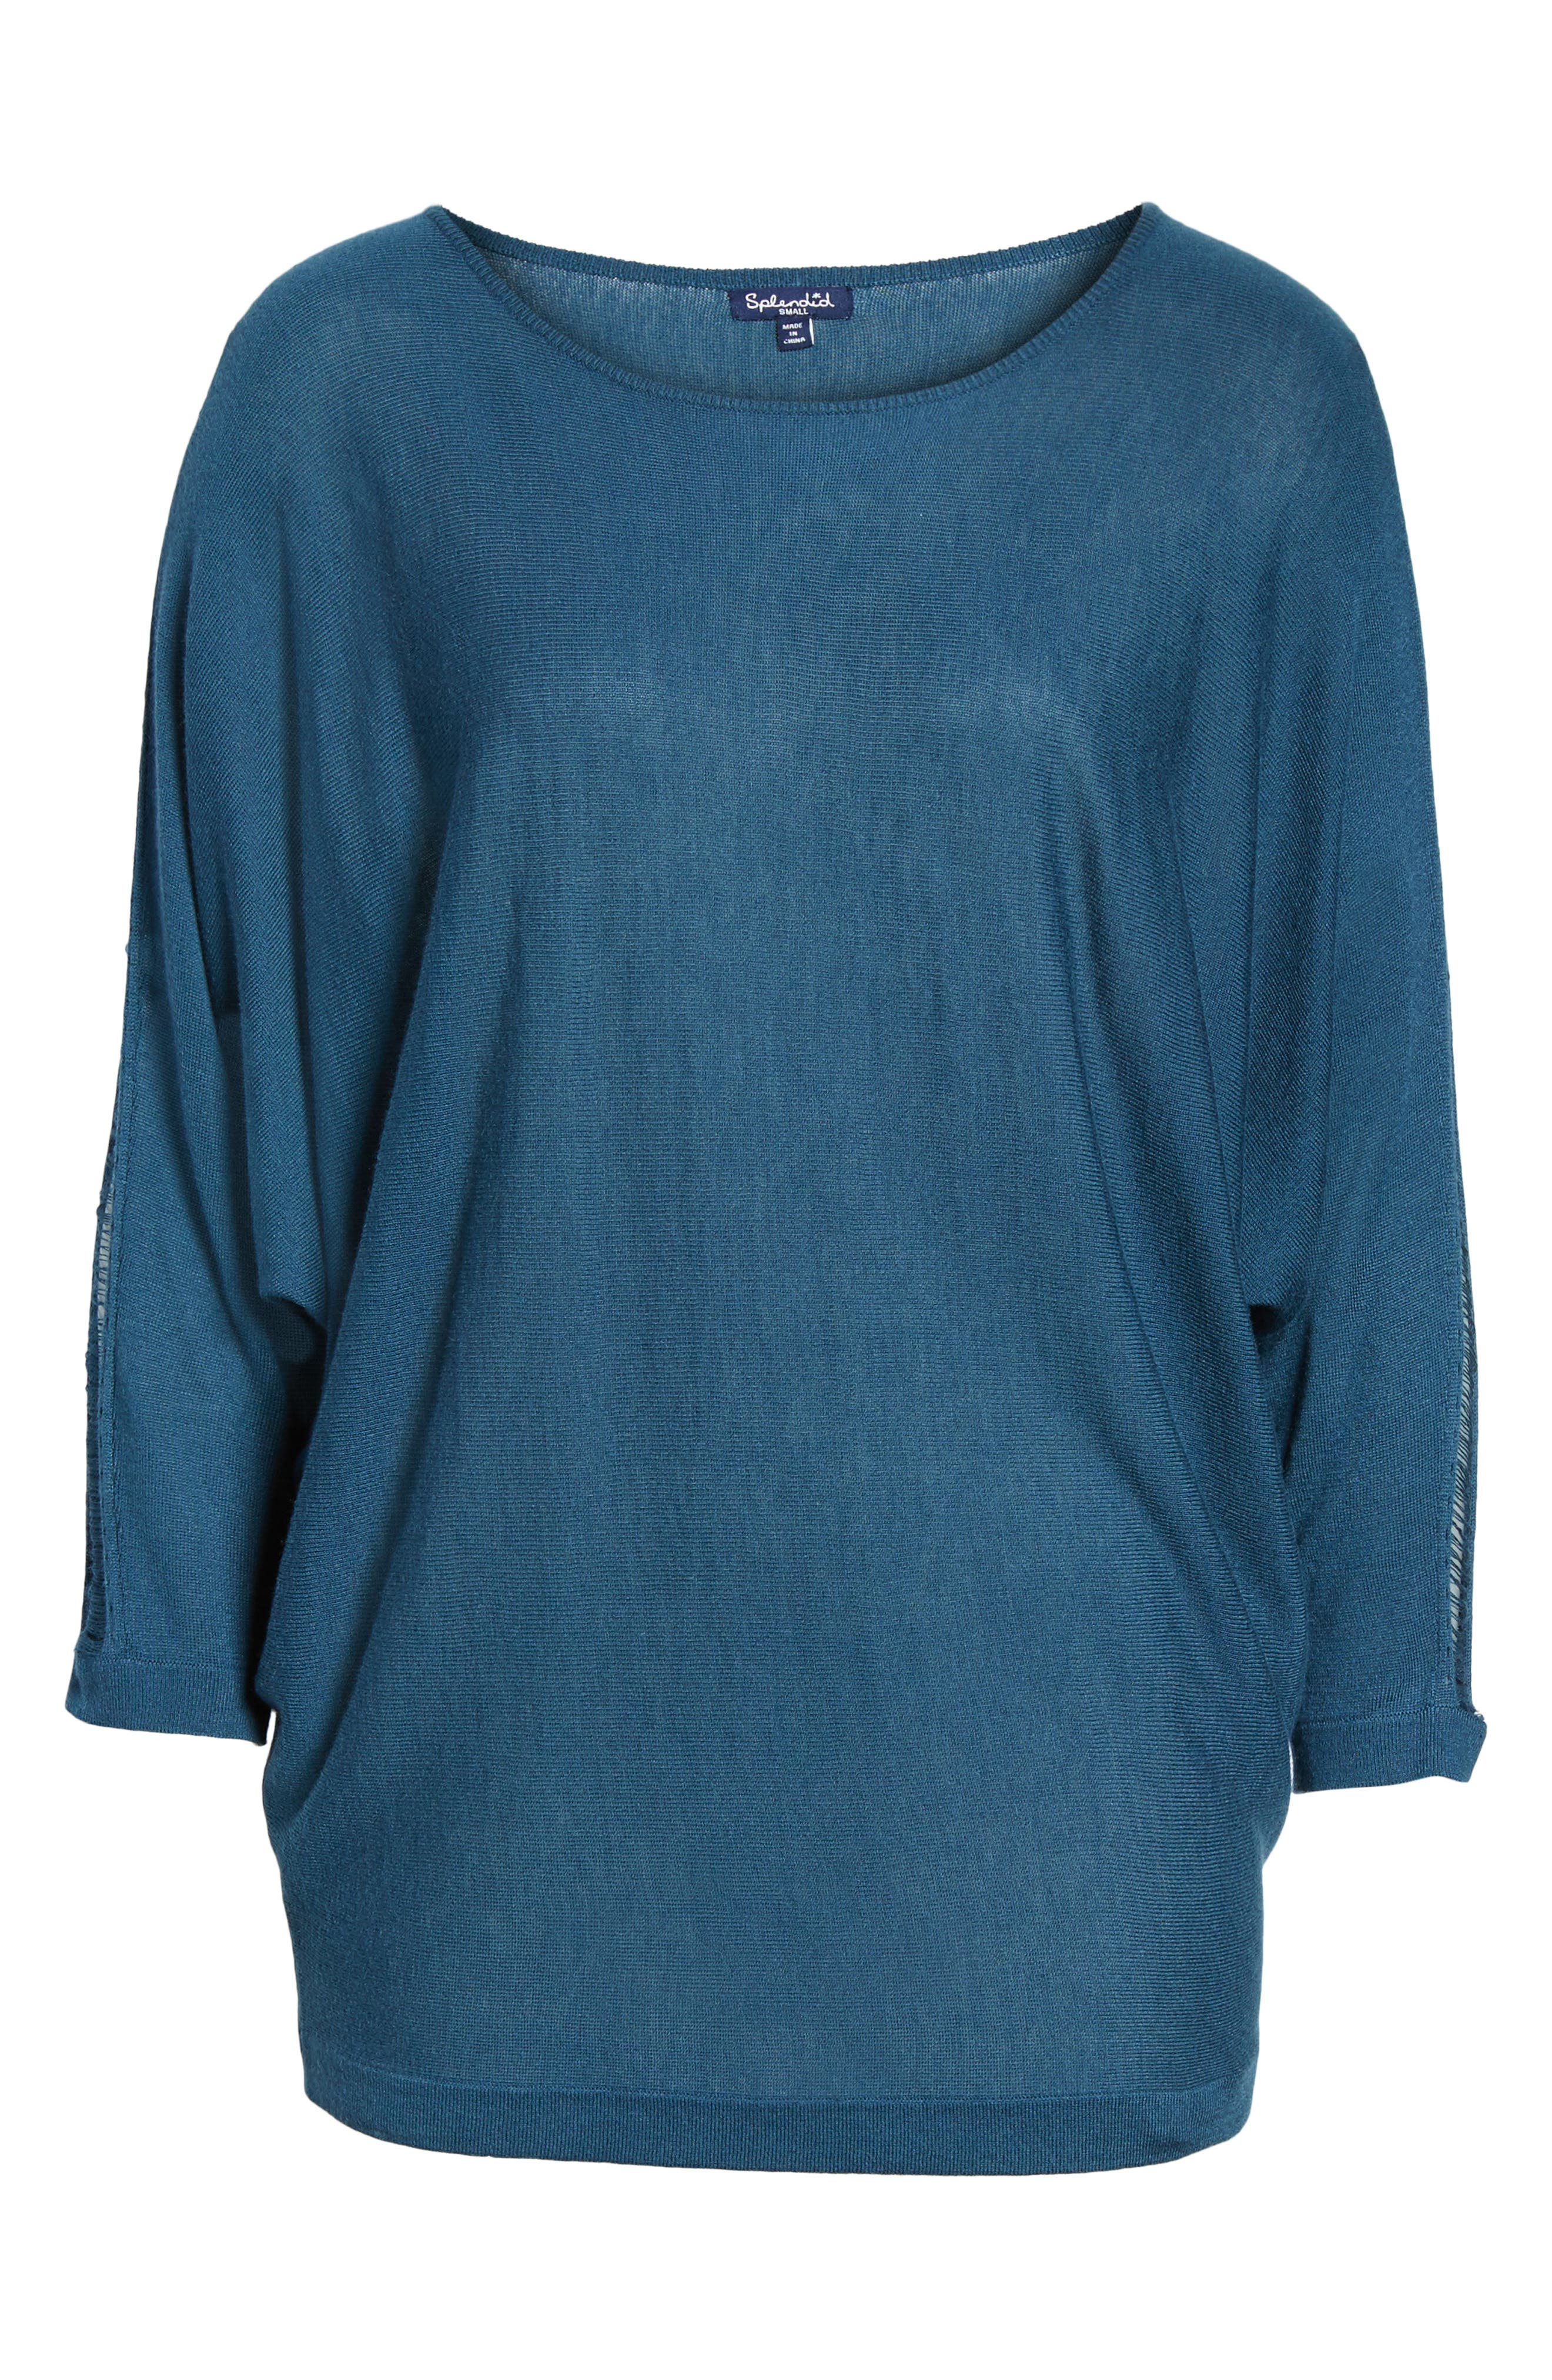 Whitlock Sweater,                             Alternate thumbnail 12, color,